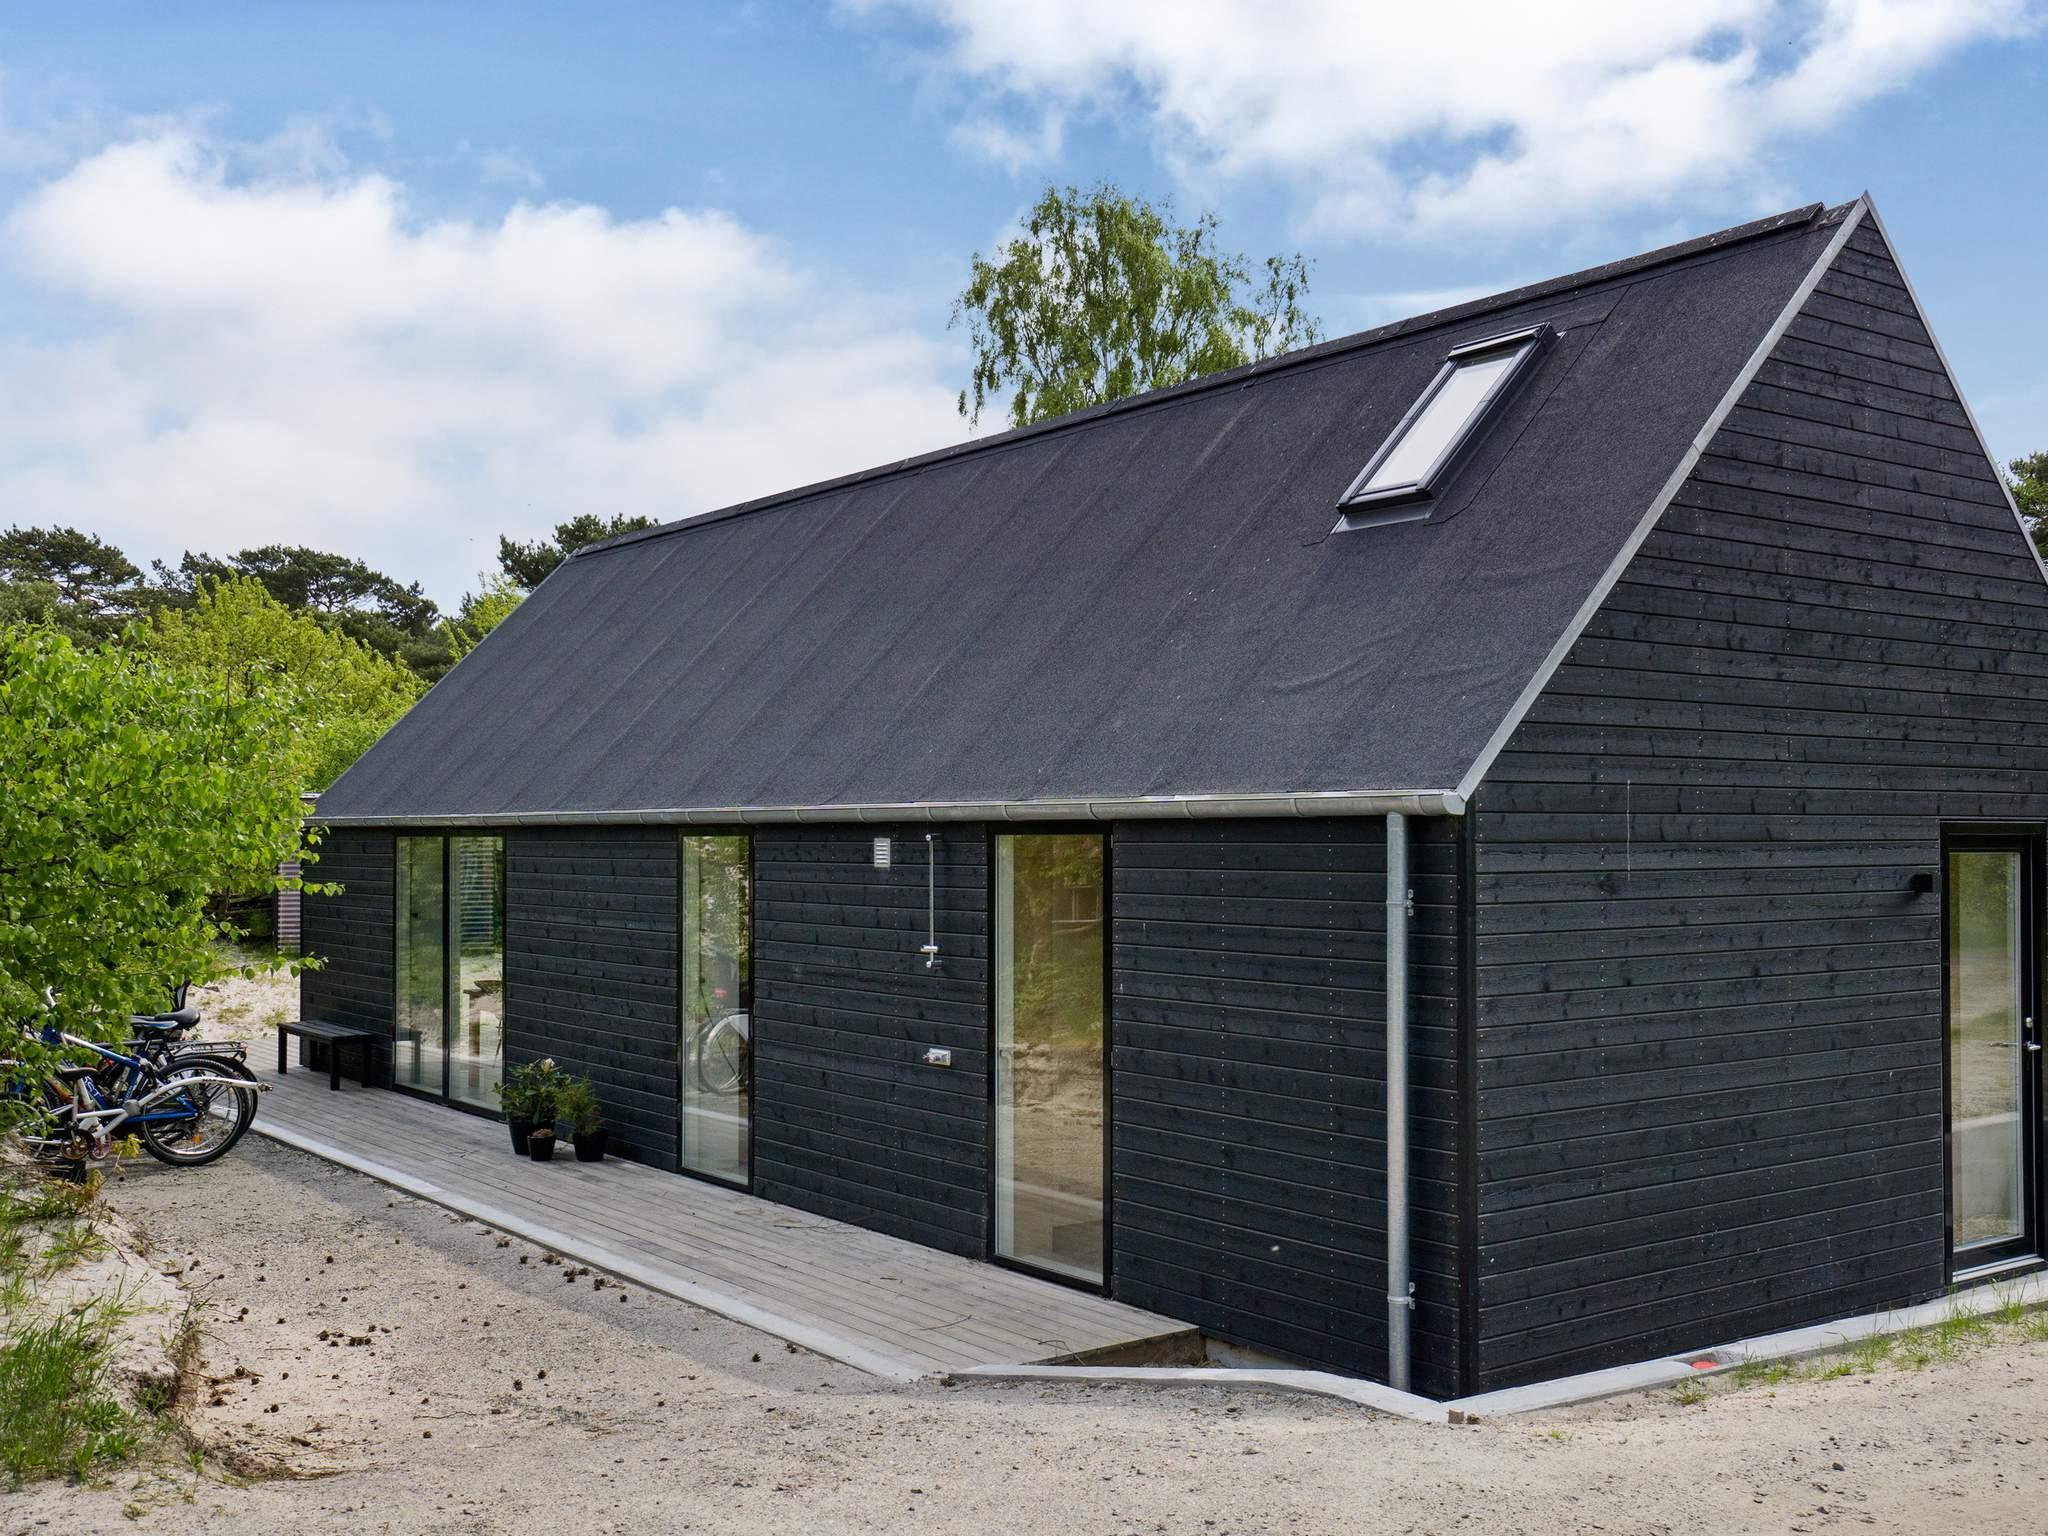 Ferienhaus Balka Strand (2354119), Balke, , Bornholm, Dänemark, Bild 11